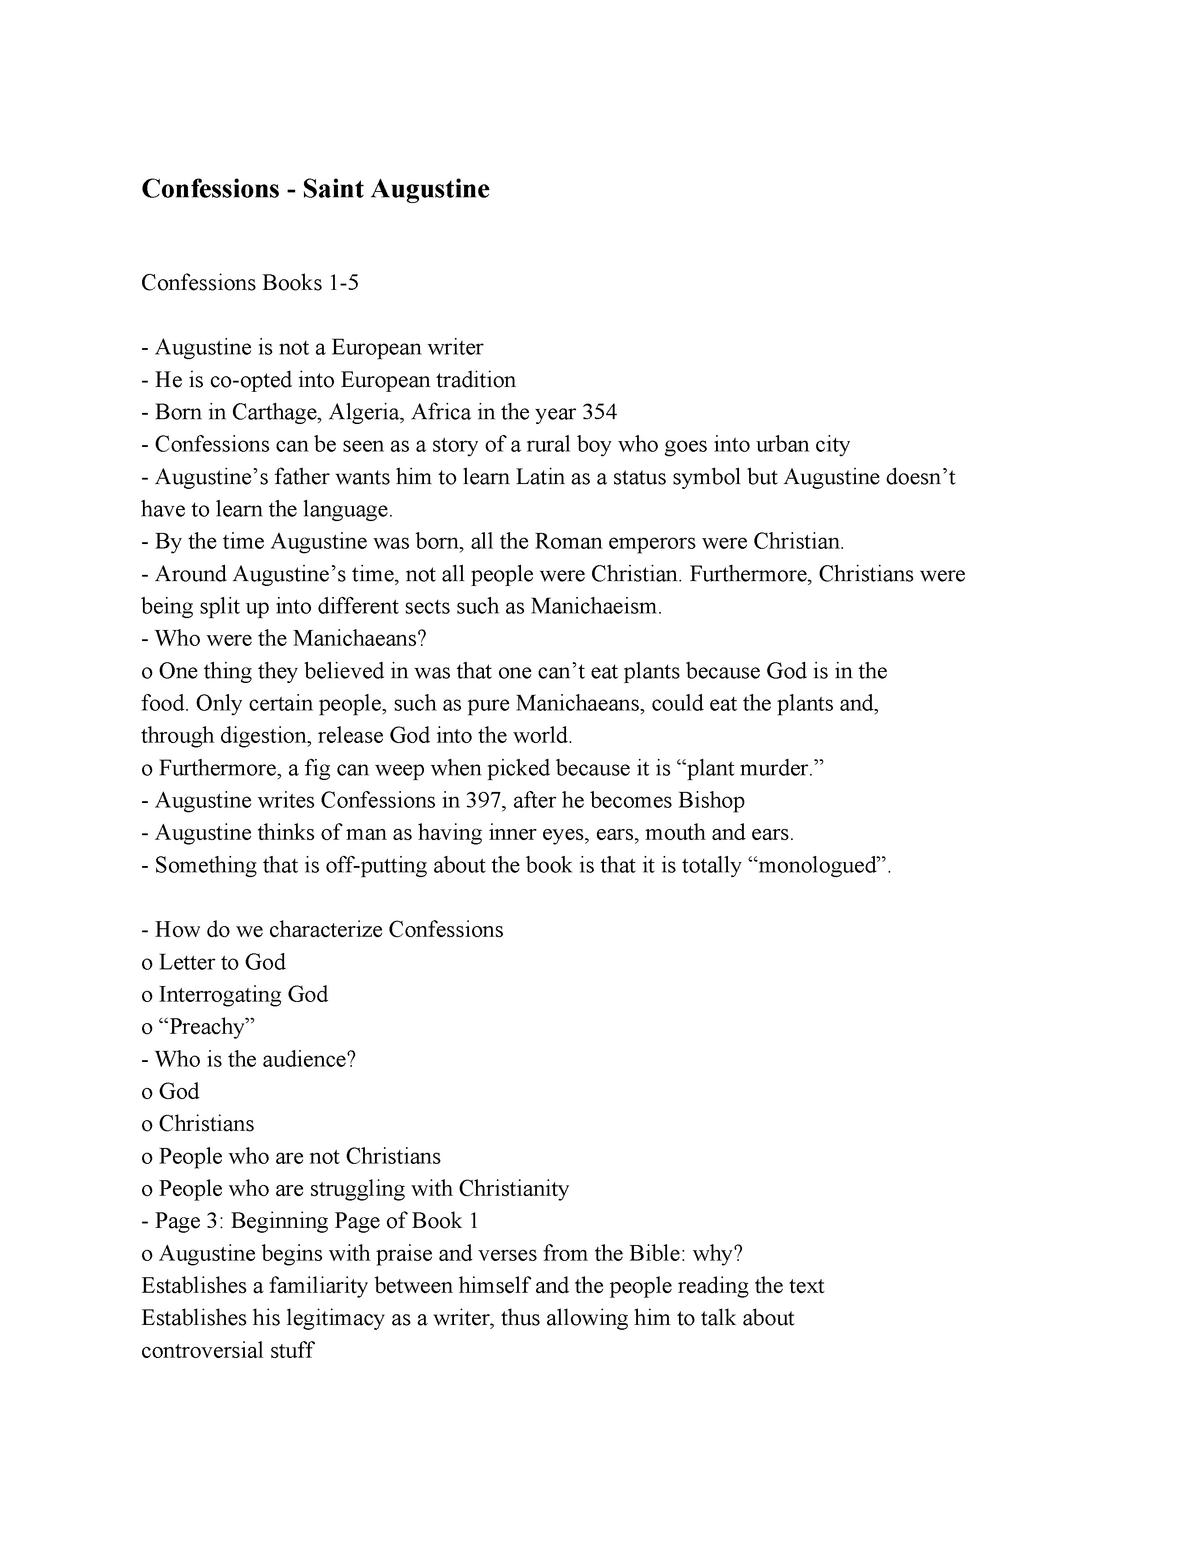 Lit Hum Study Guides - Summary EURPN LIT-PHILOS MASTERPIECS